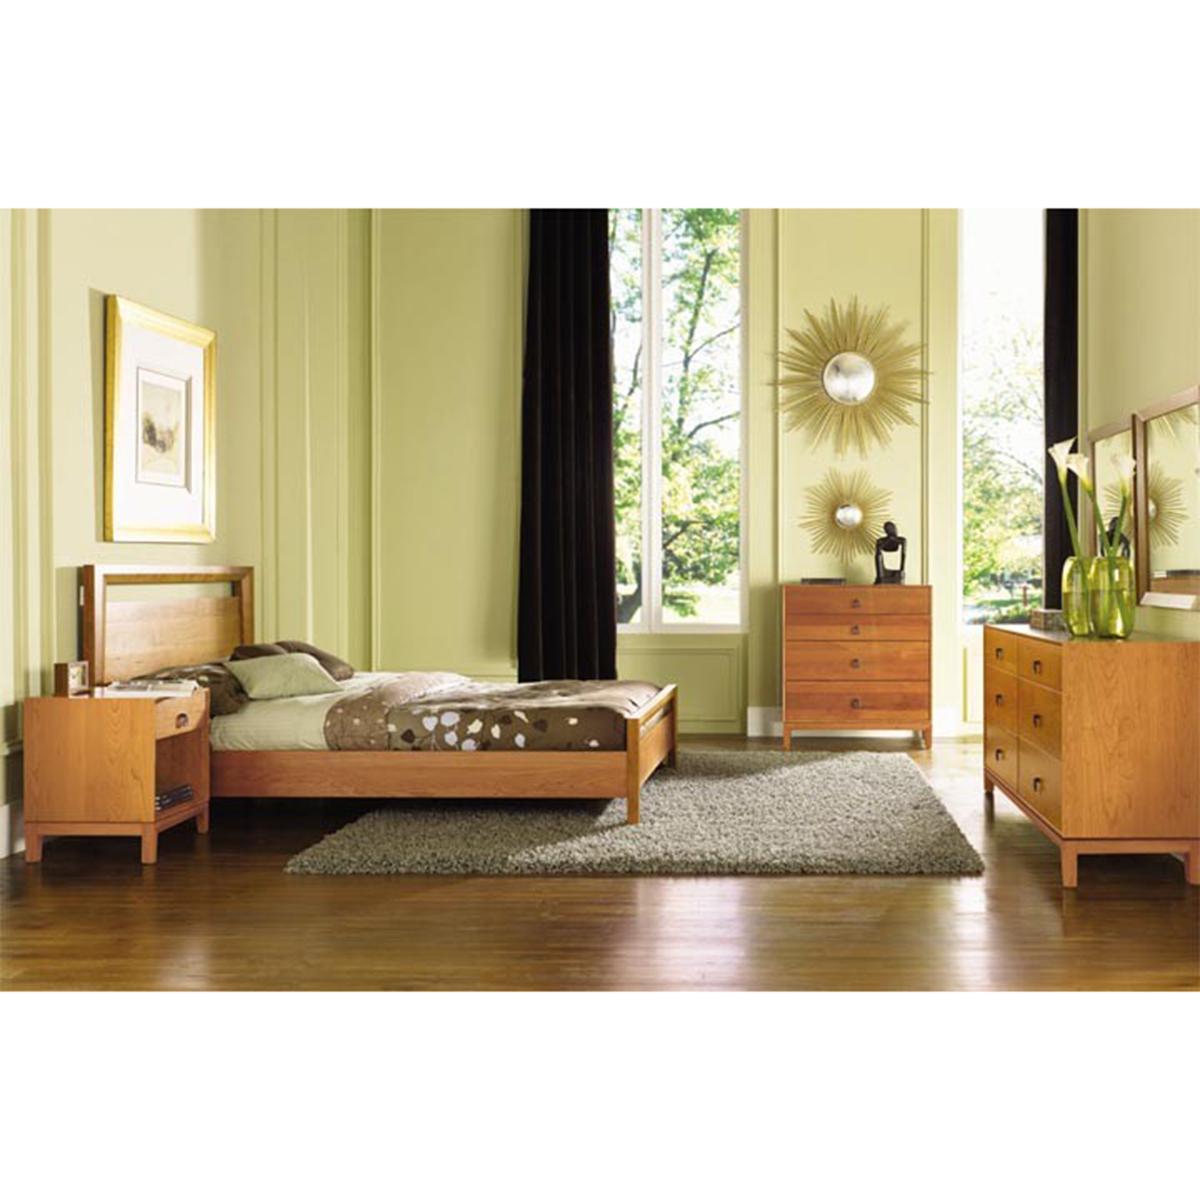 Copeland Furniture Mansfield 4 Piece Bedroom Set